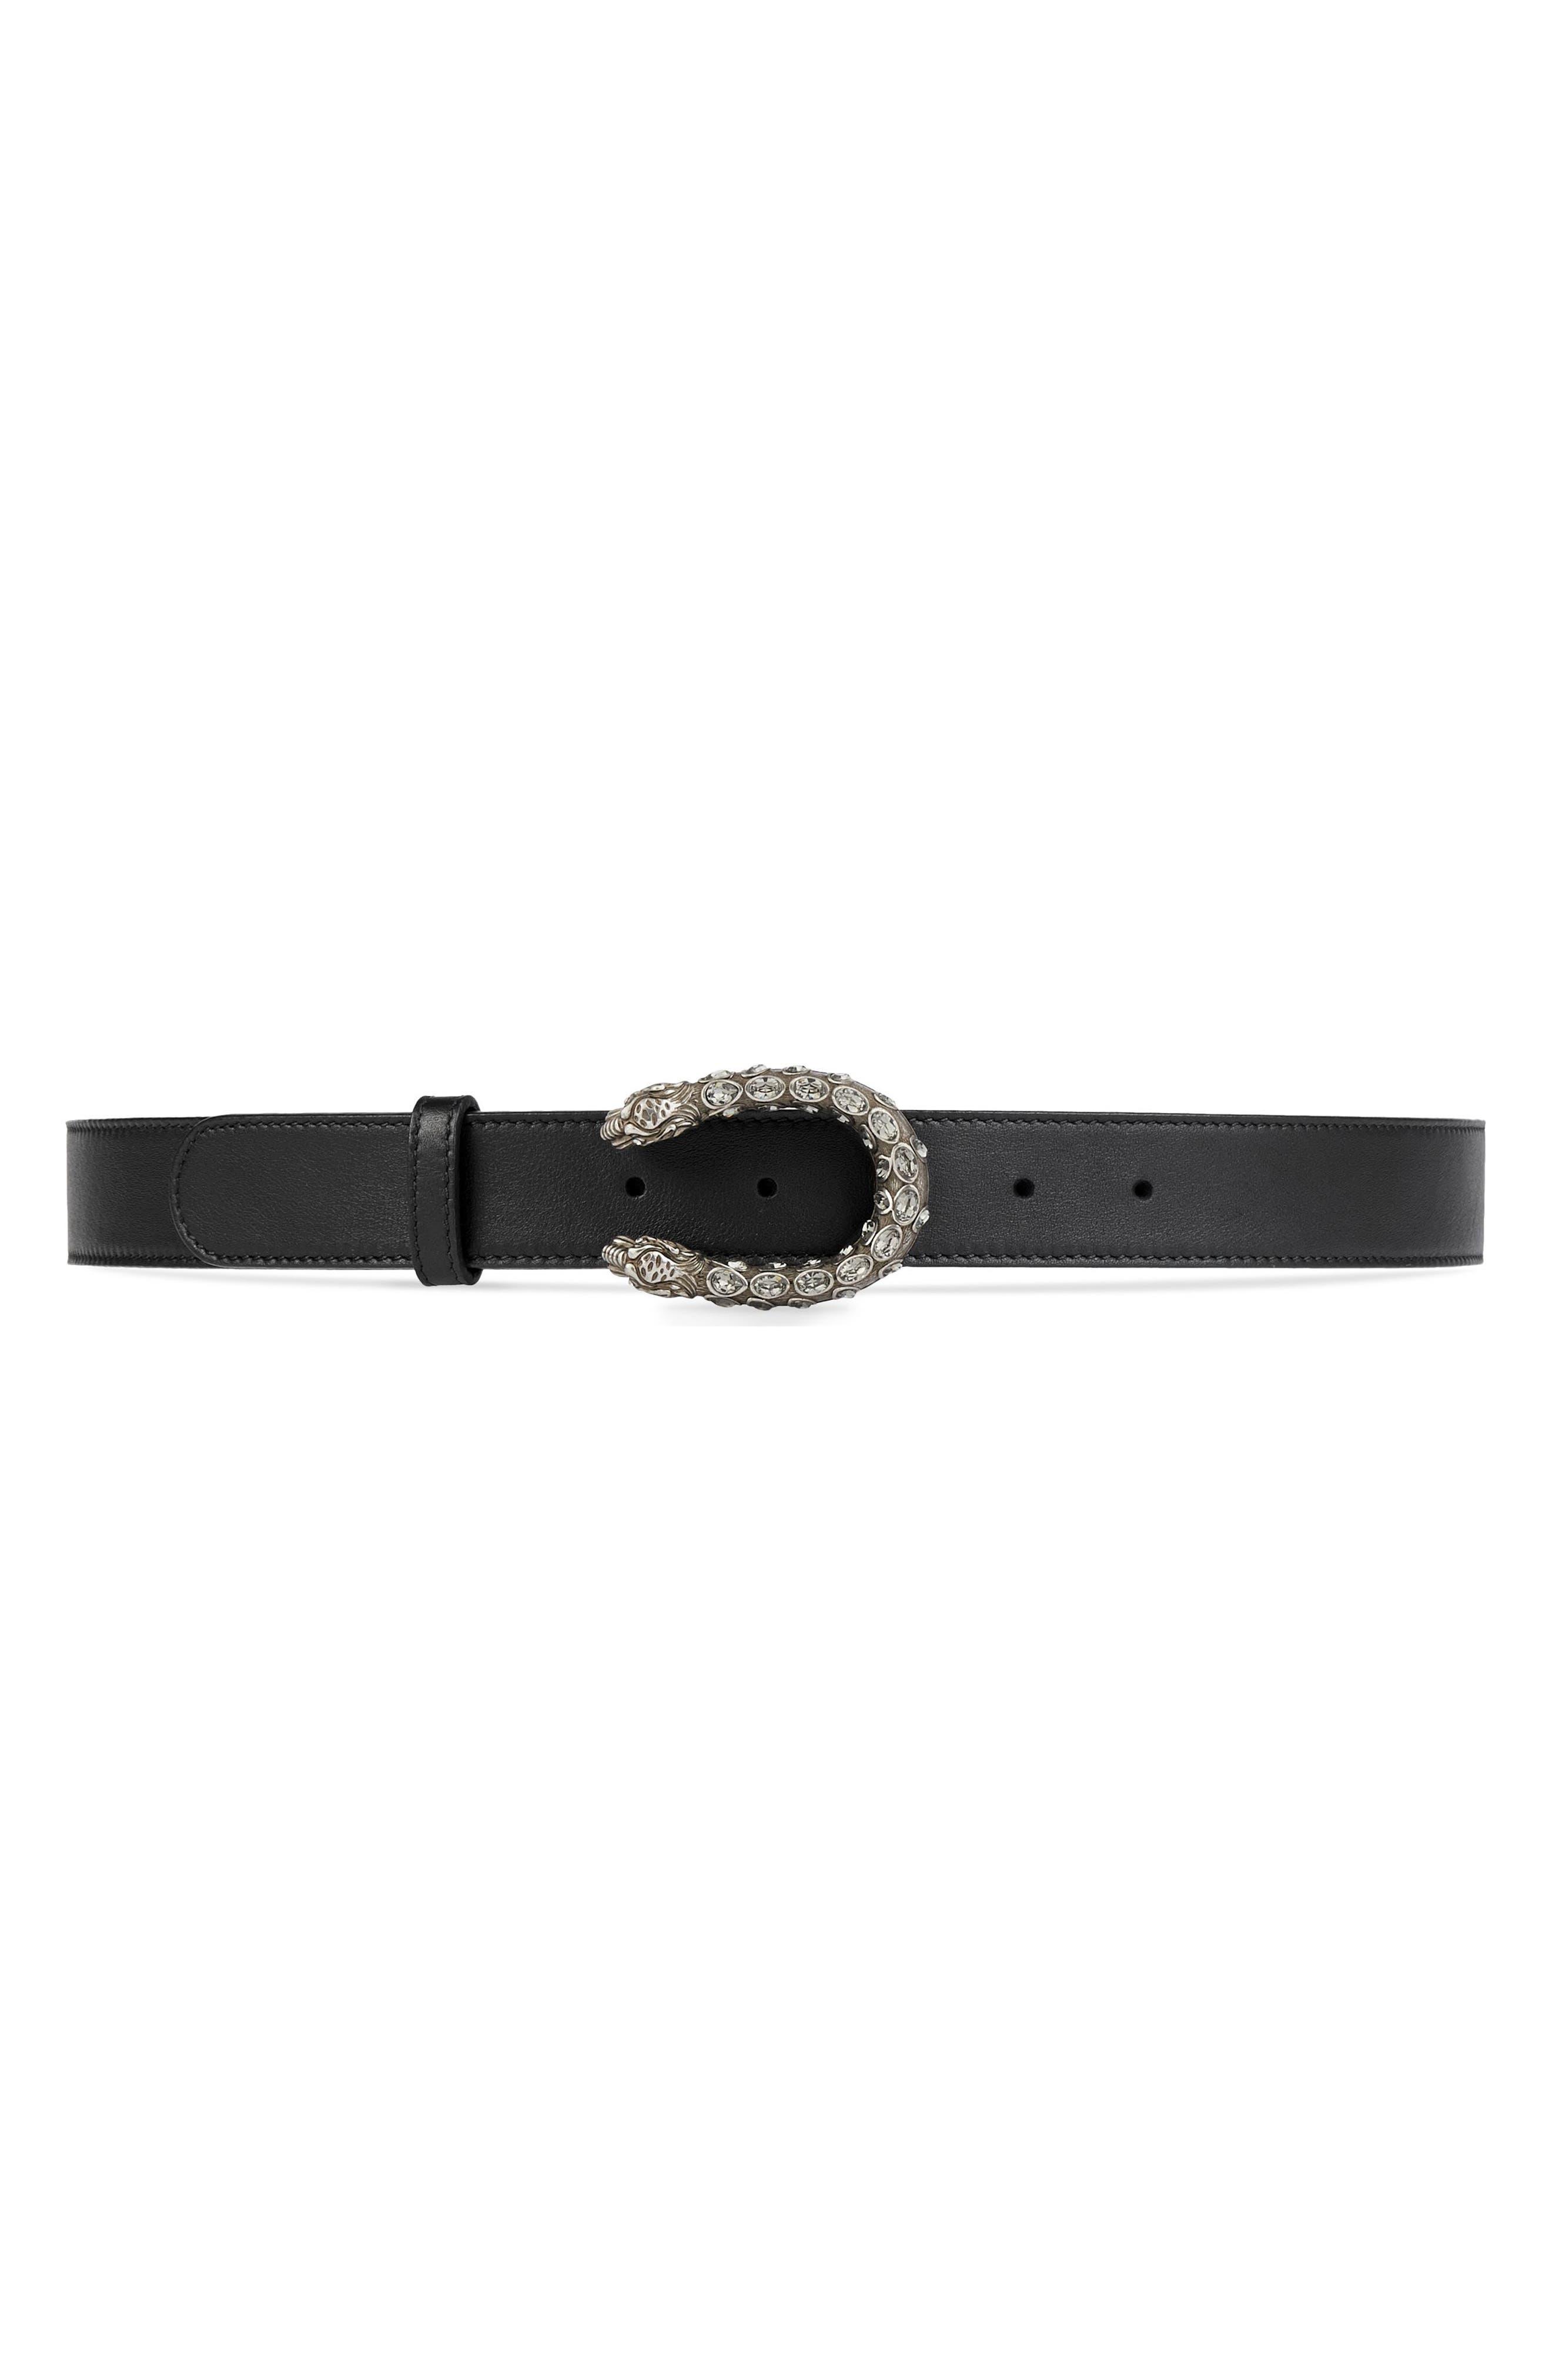 GUCCI Leather Belt, Main, color, BLACK DIAM